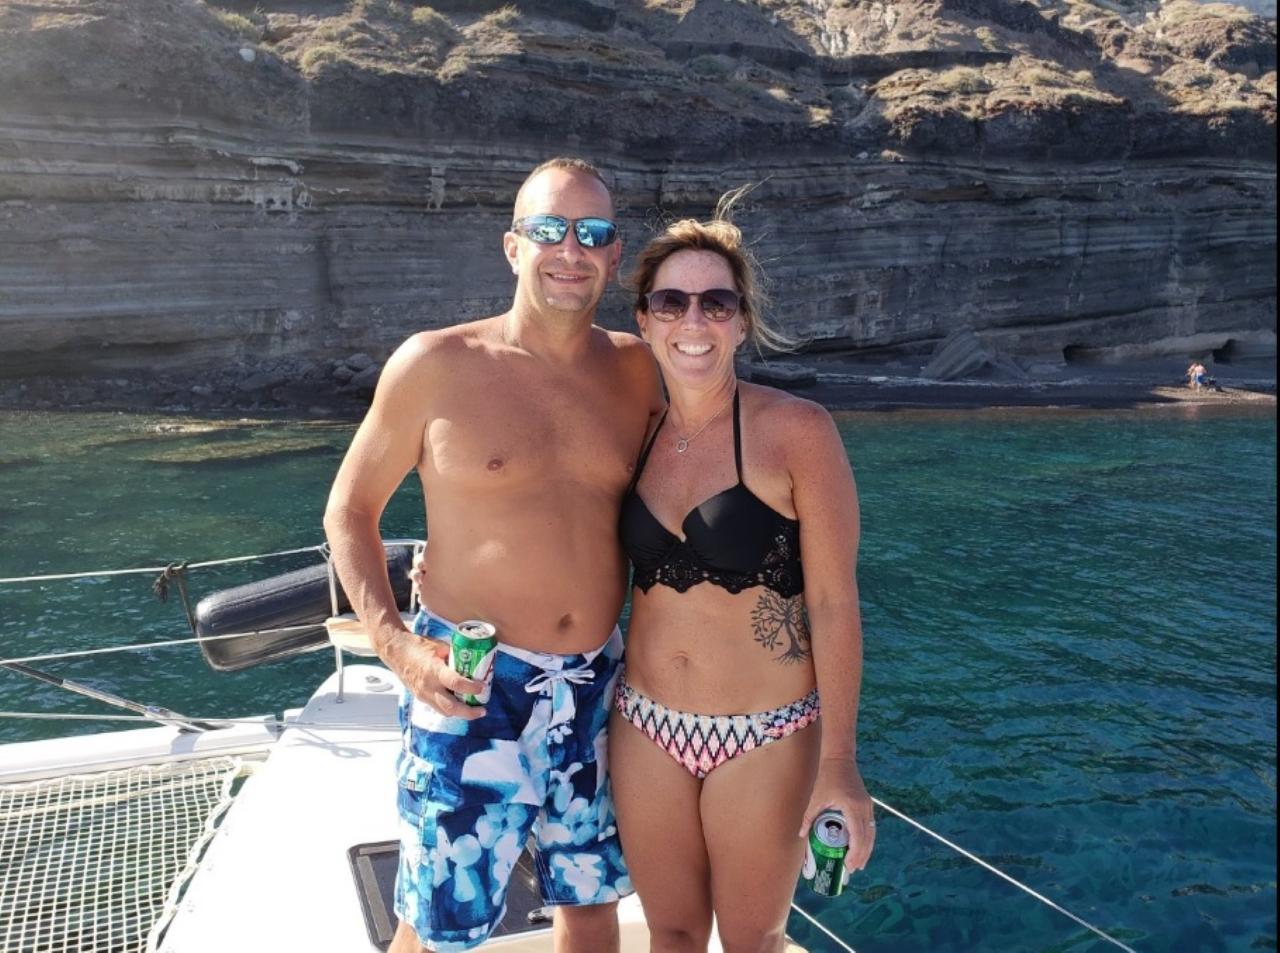 Santorini 360 Tour: Private Daytime Santorini Tour with Sunset Catamaran Dinner Cruise